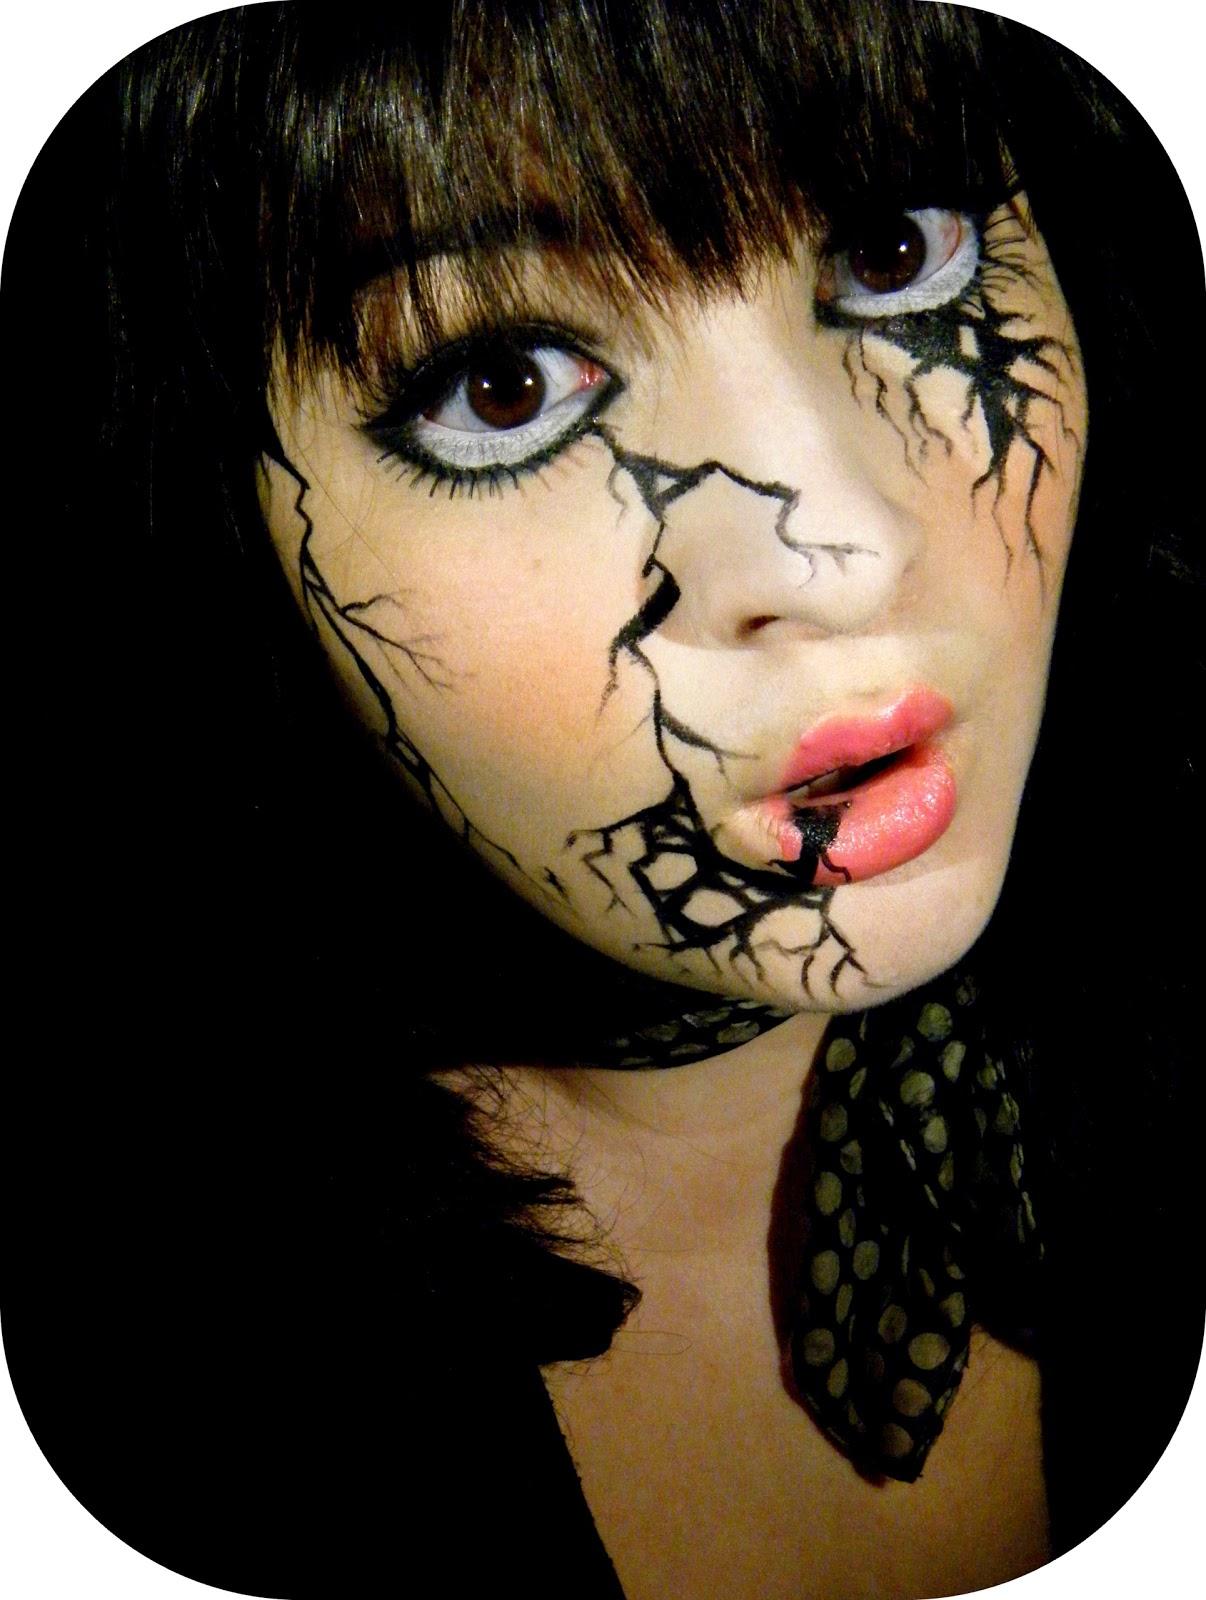 Mon petit coin beaut maquillage halloween 2 broken doll - Maquillage qui fait peur ...